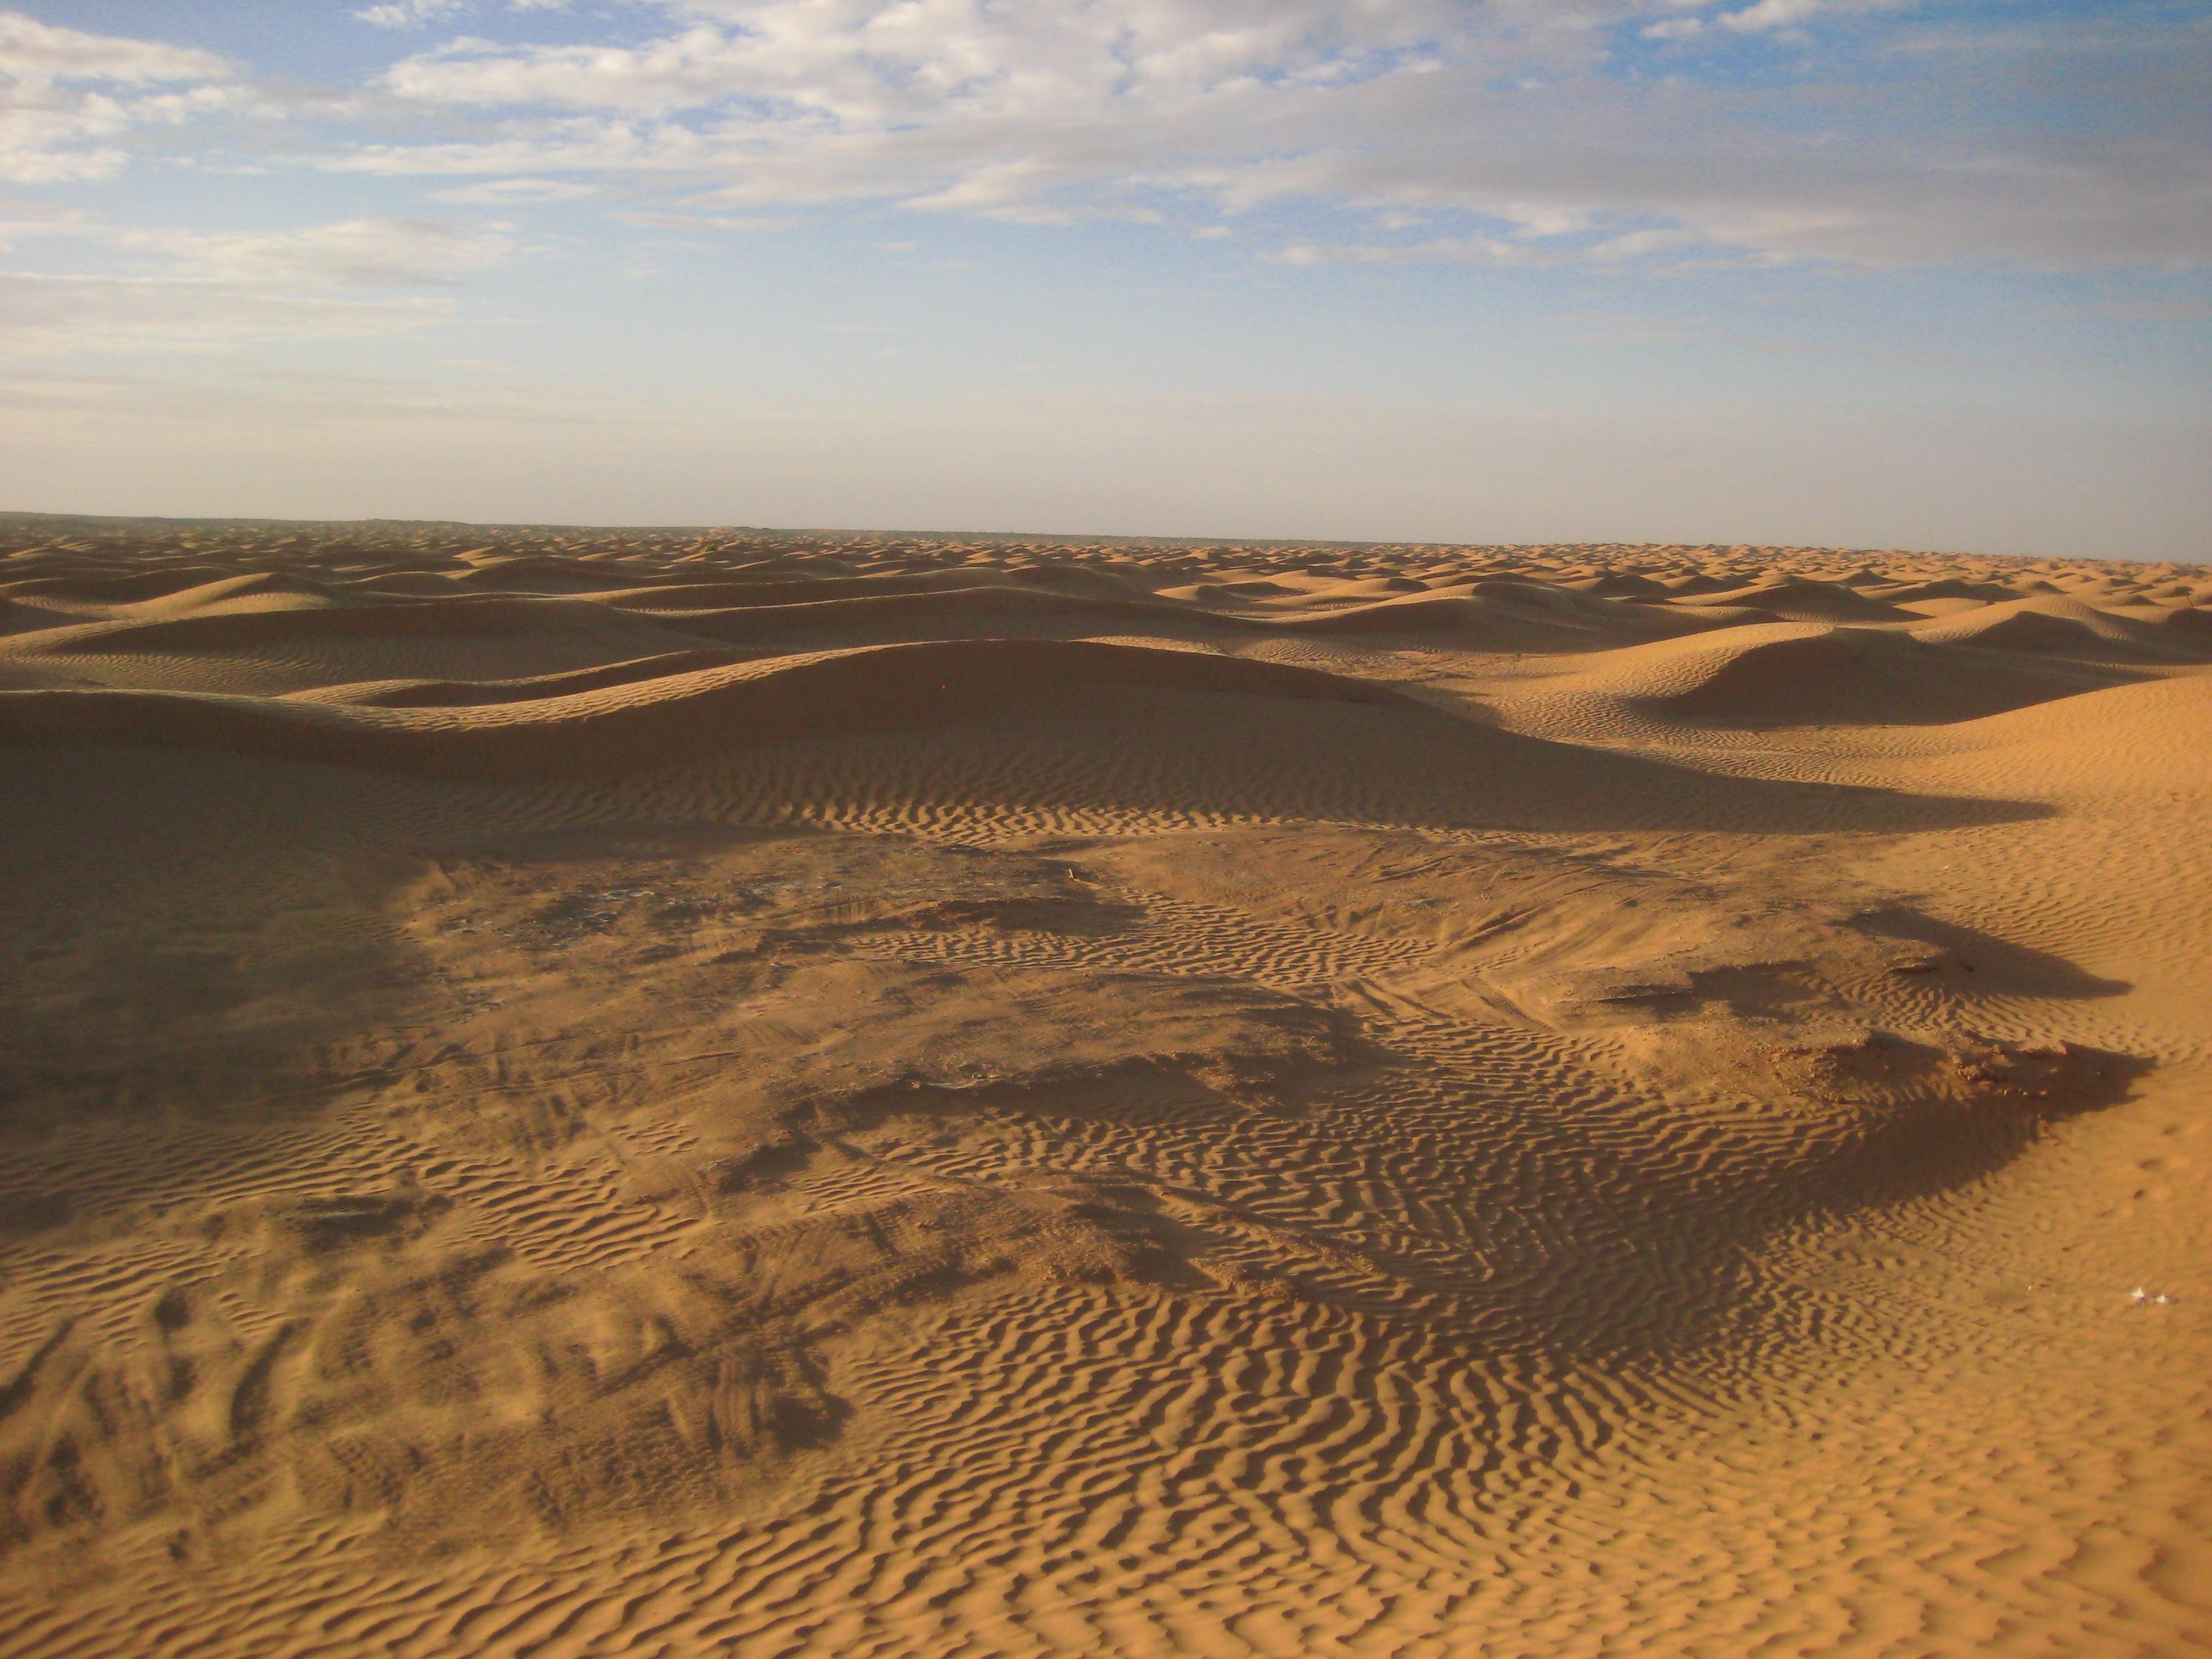 Les dunes du SAHARA, en Tunisie